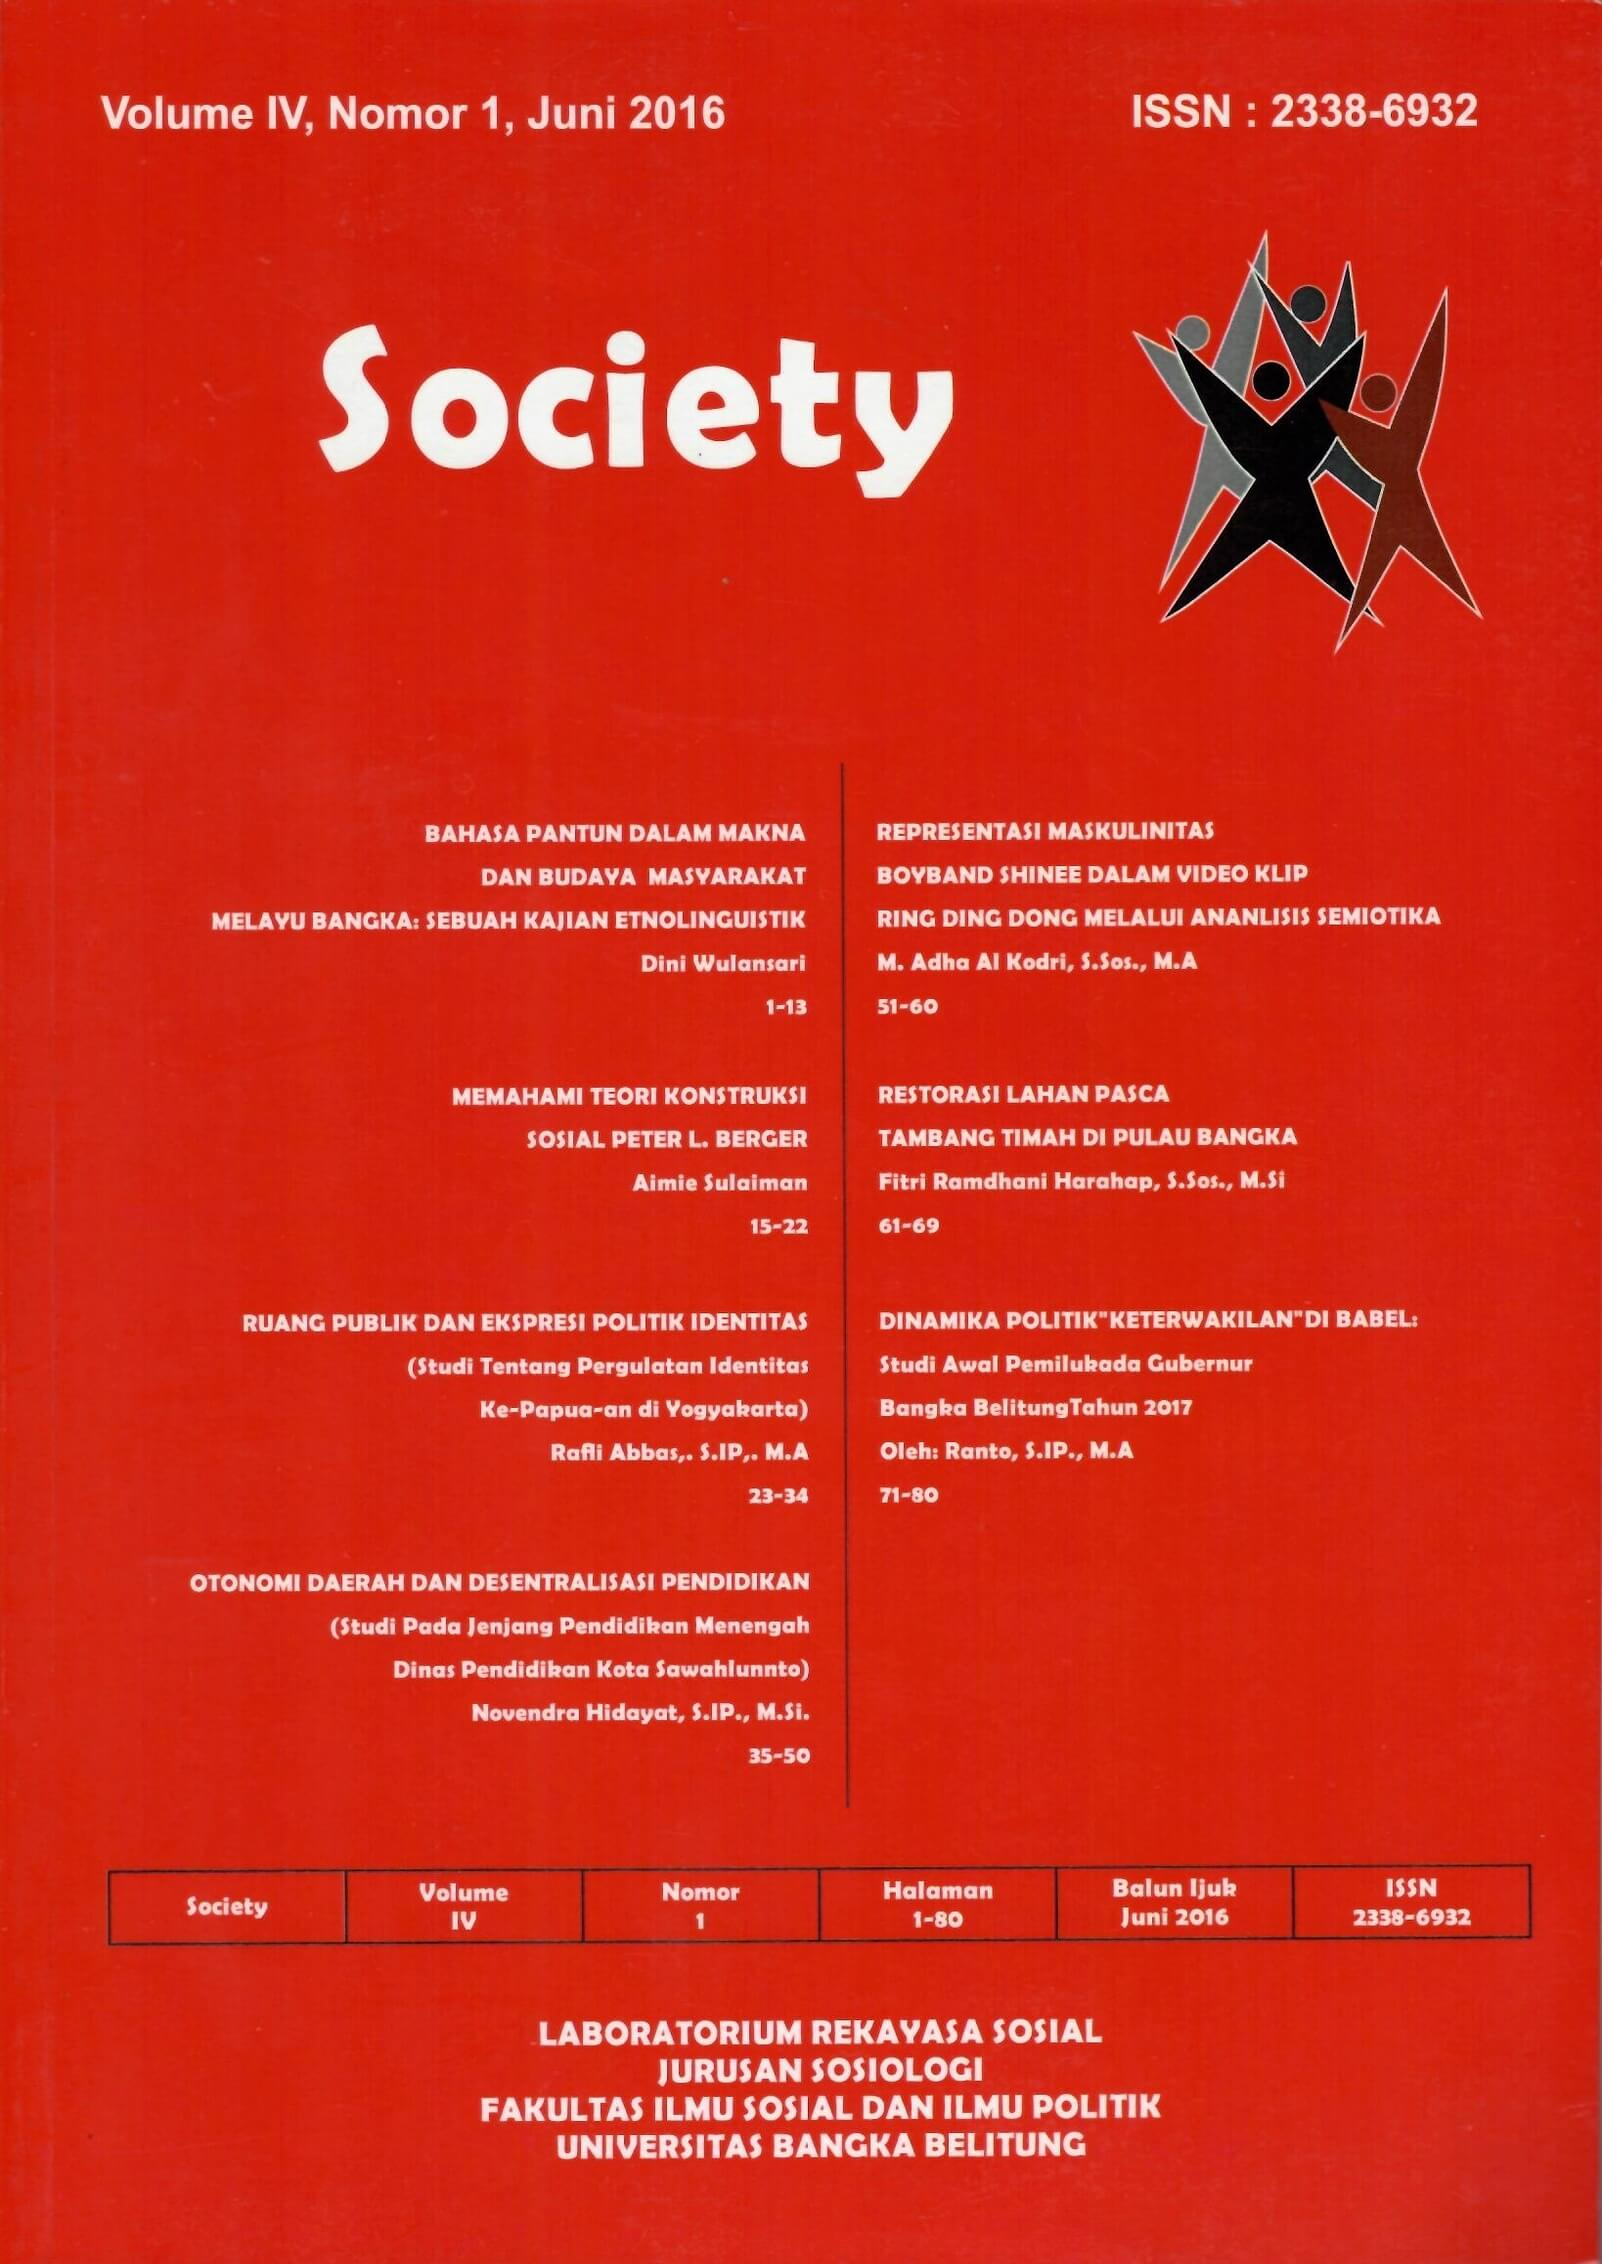 Jurnal Society Volume 4 Nomor 1#Juni 2016